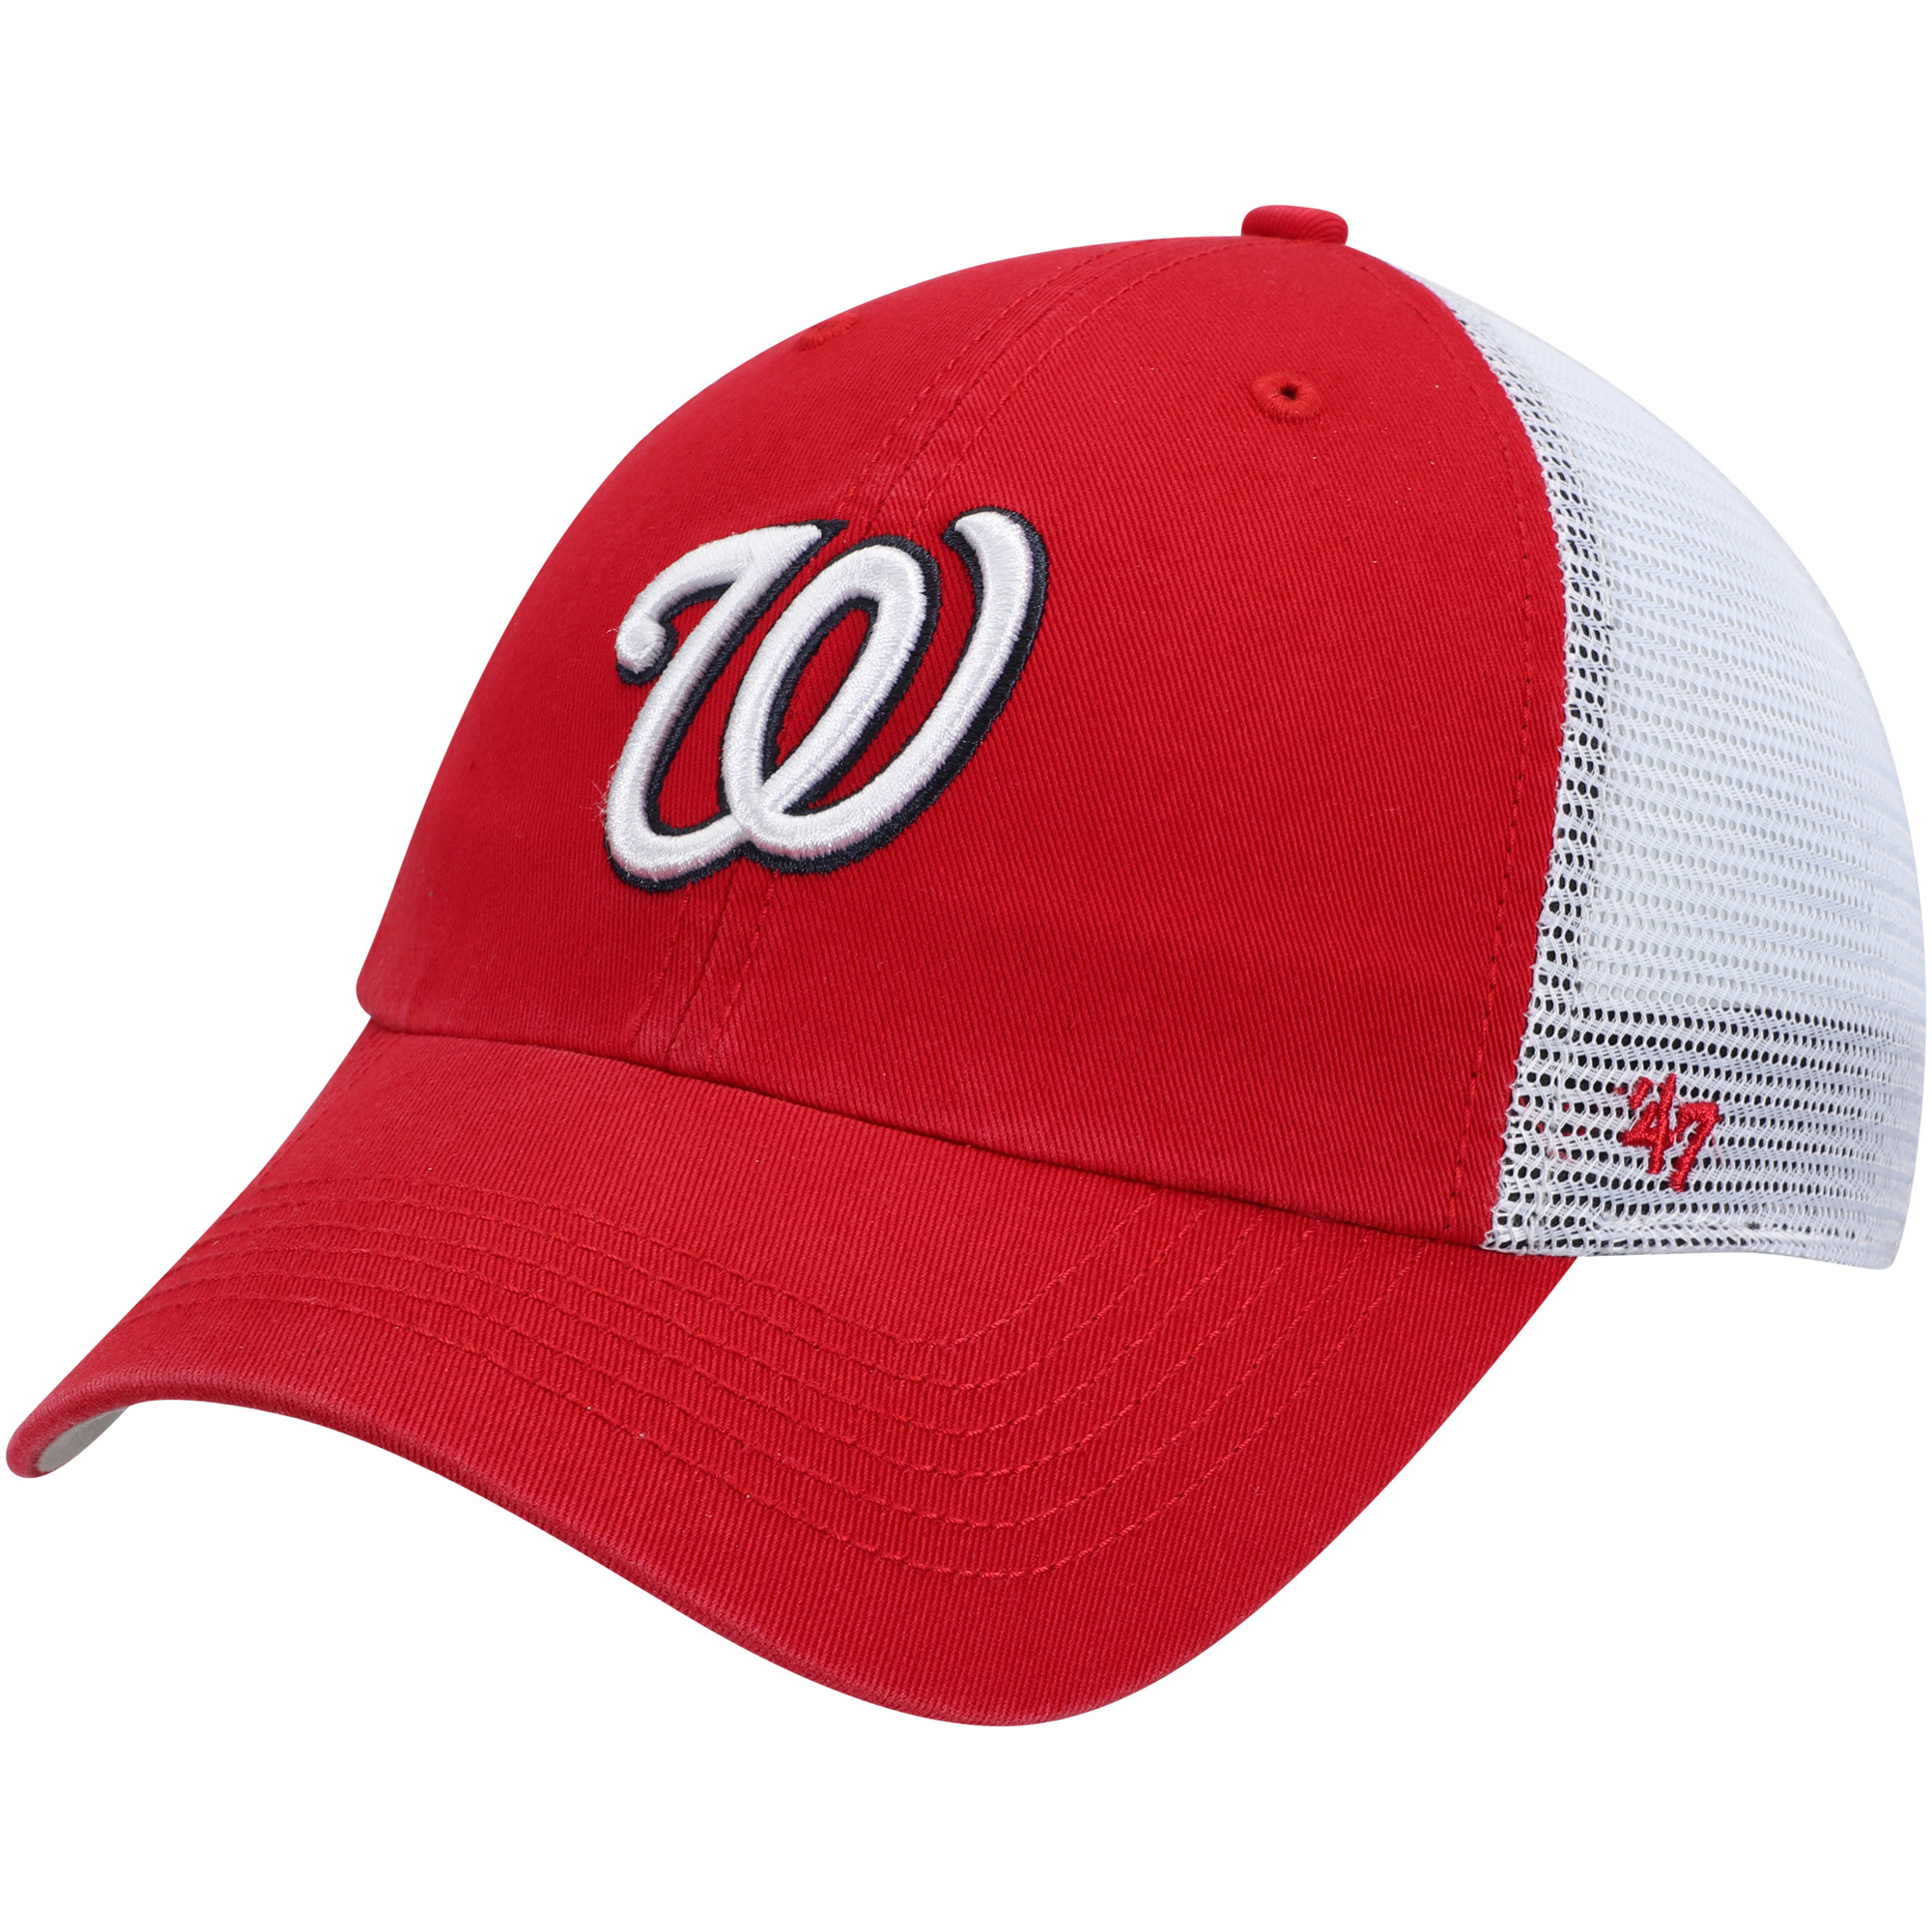 Washington Nationals '47 Blue Hill Closer Flex Hat - Red/White - OSFM